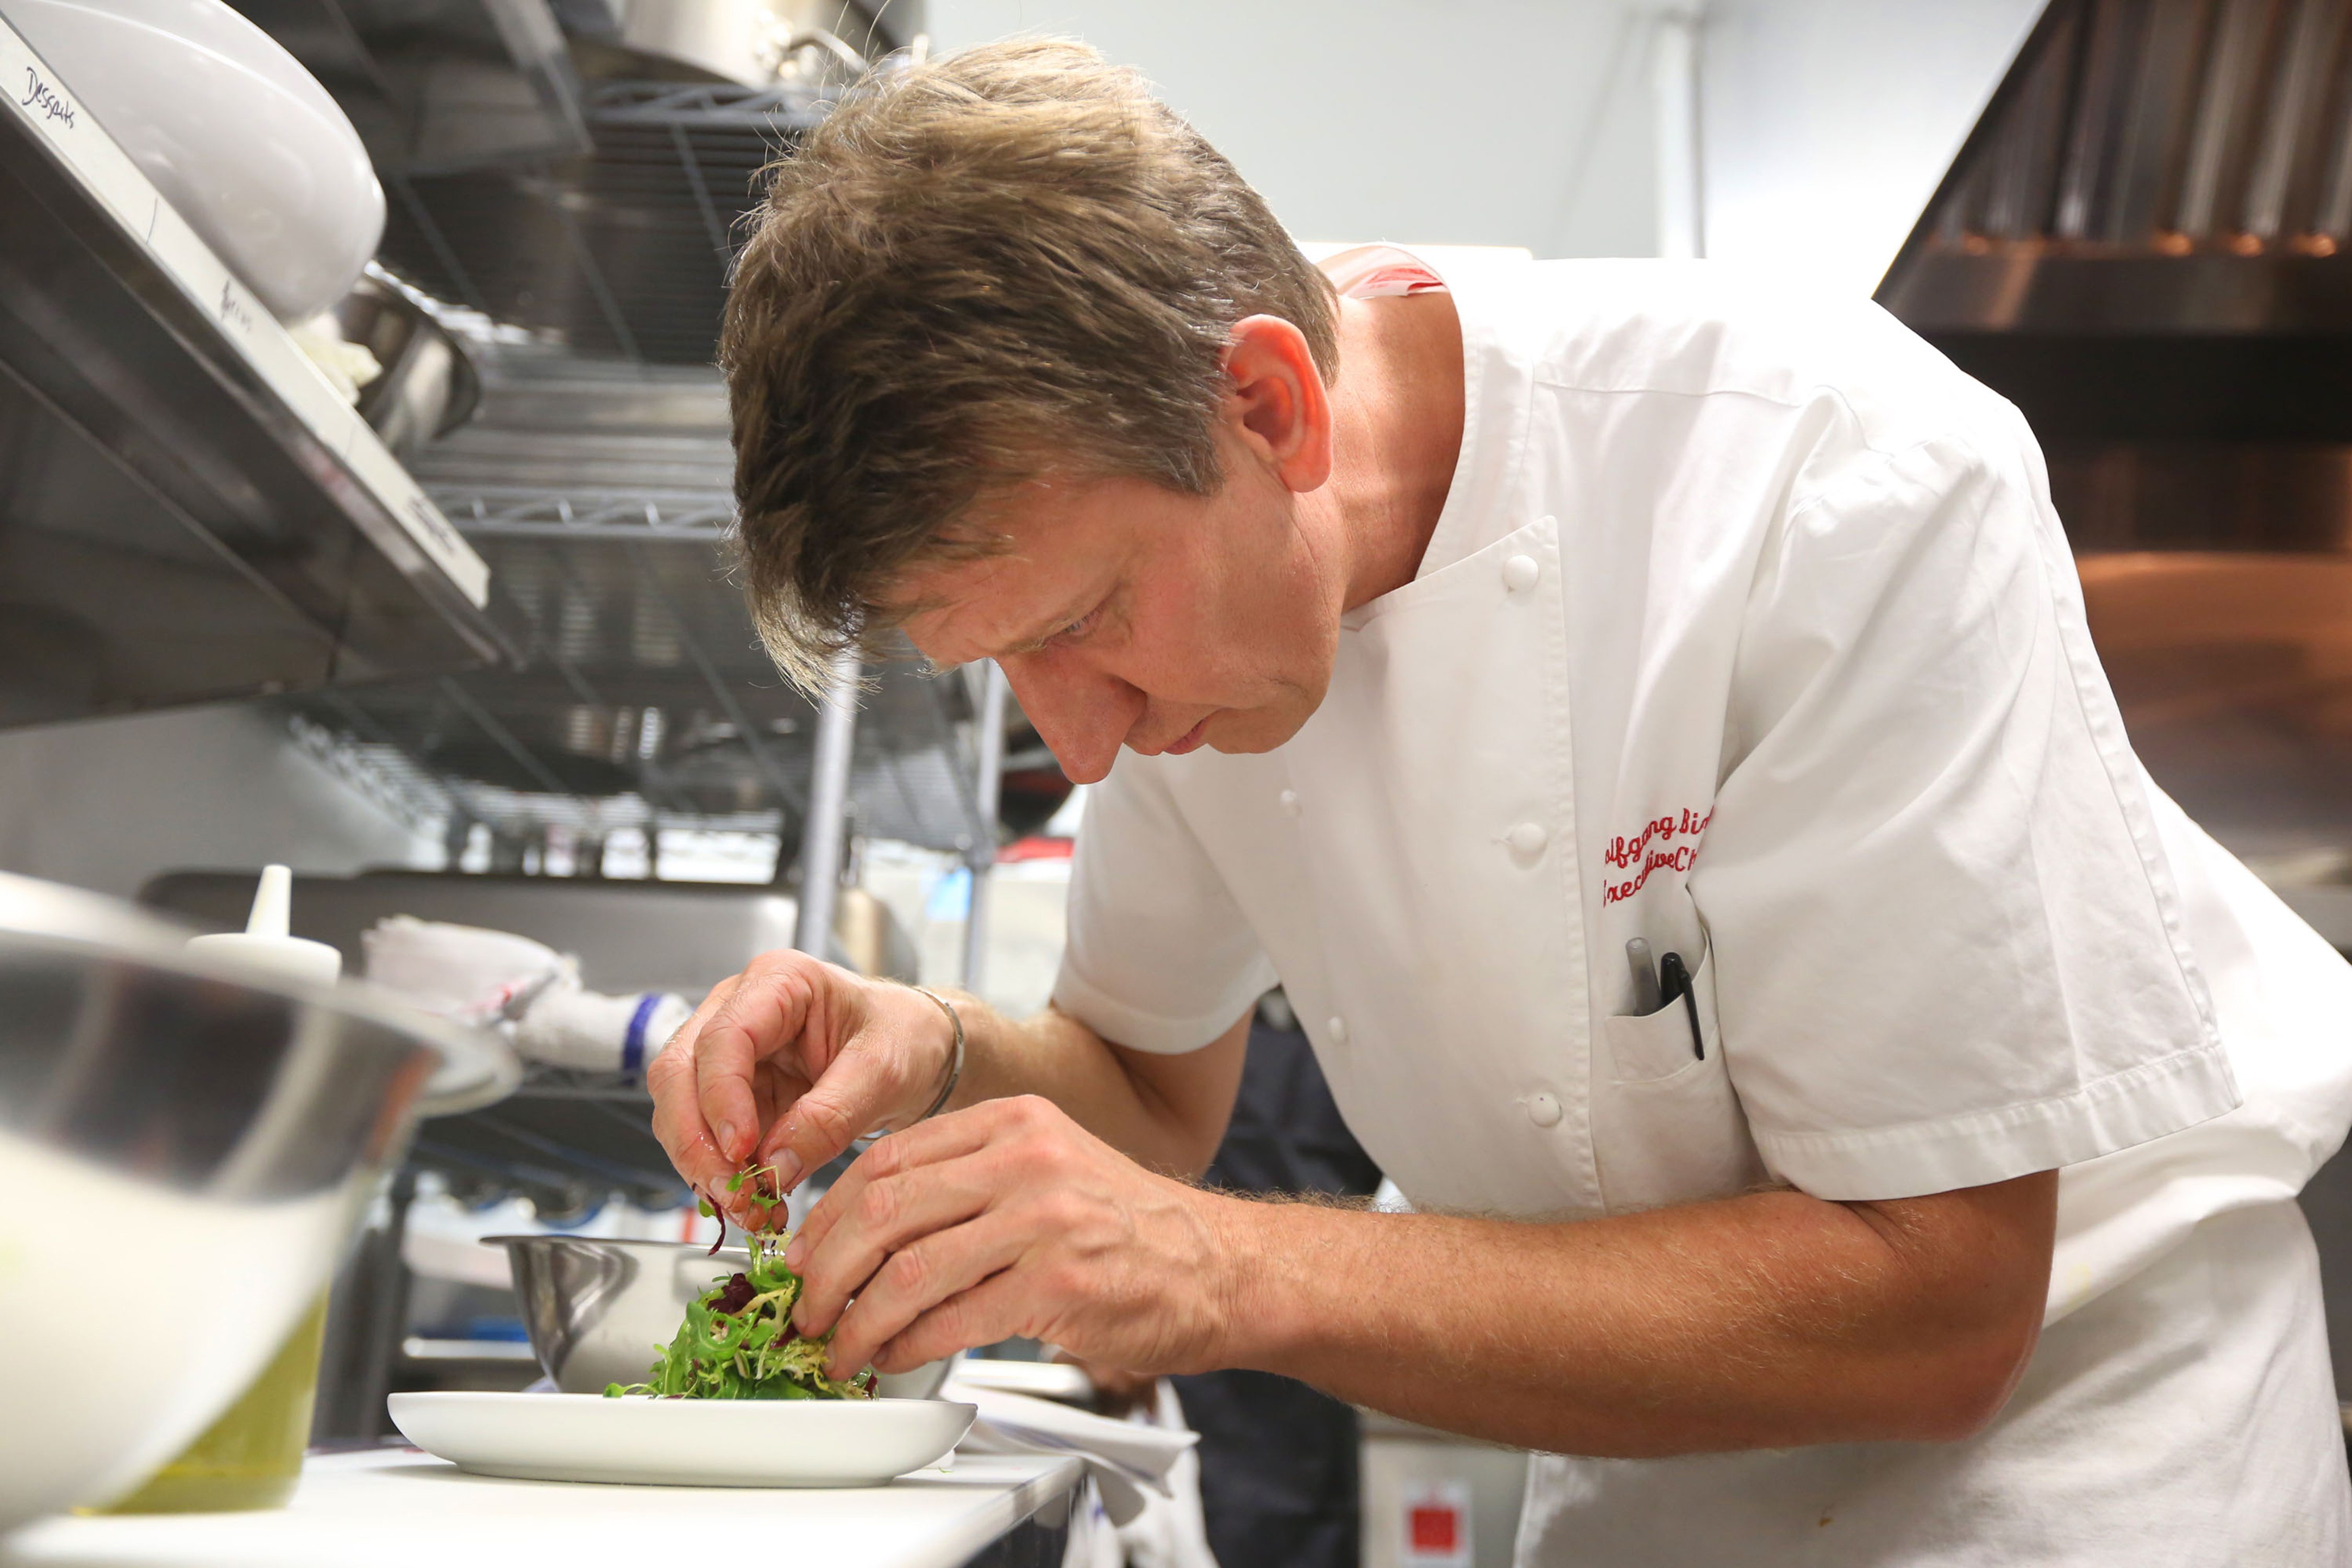 Executive Chef Wolfgang Birk